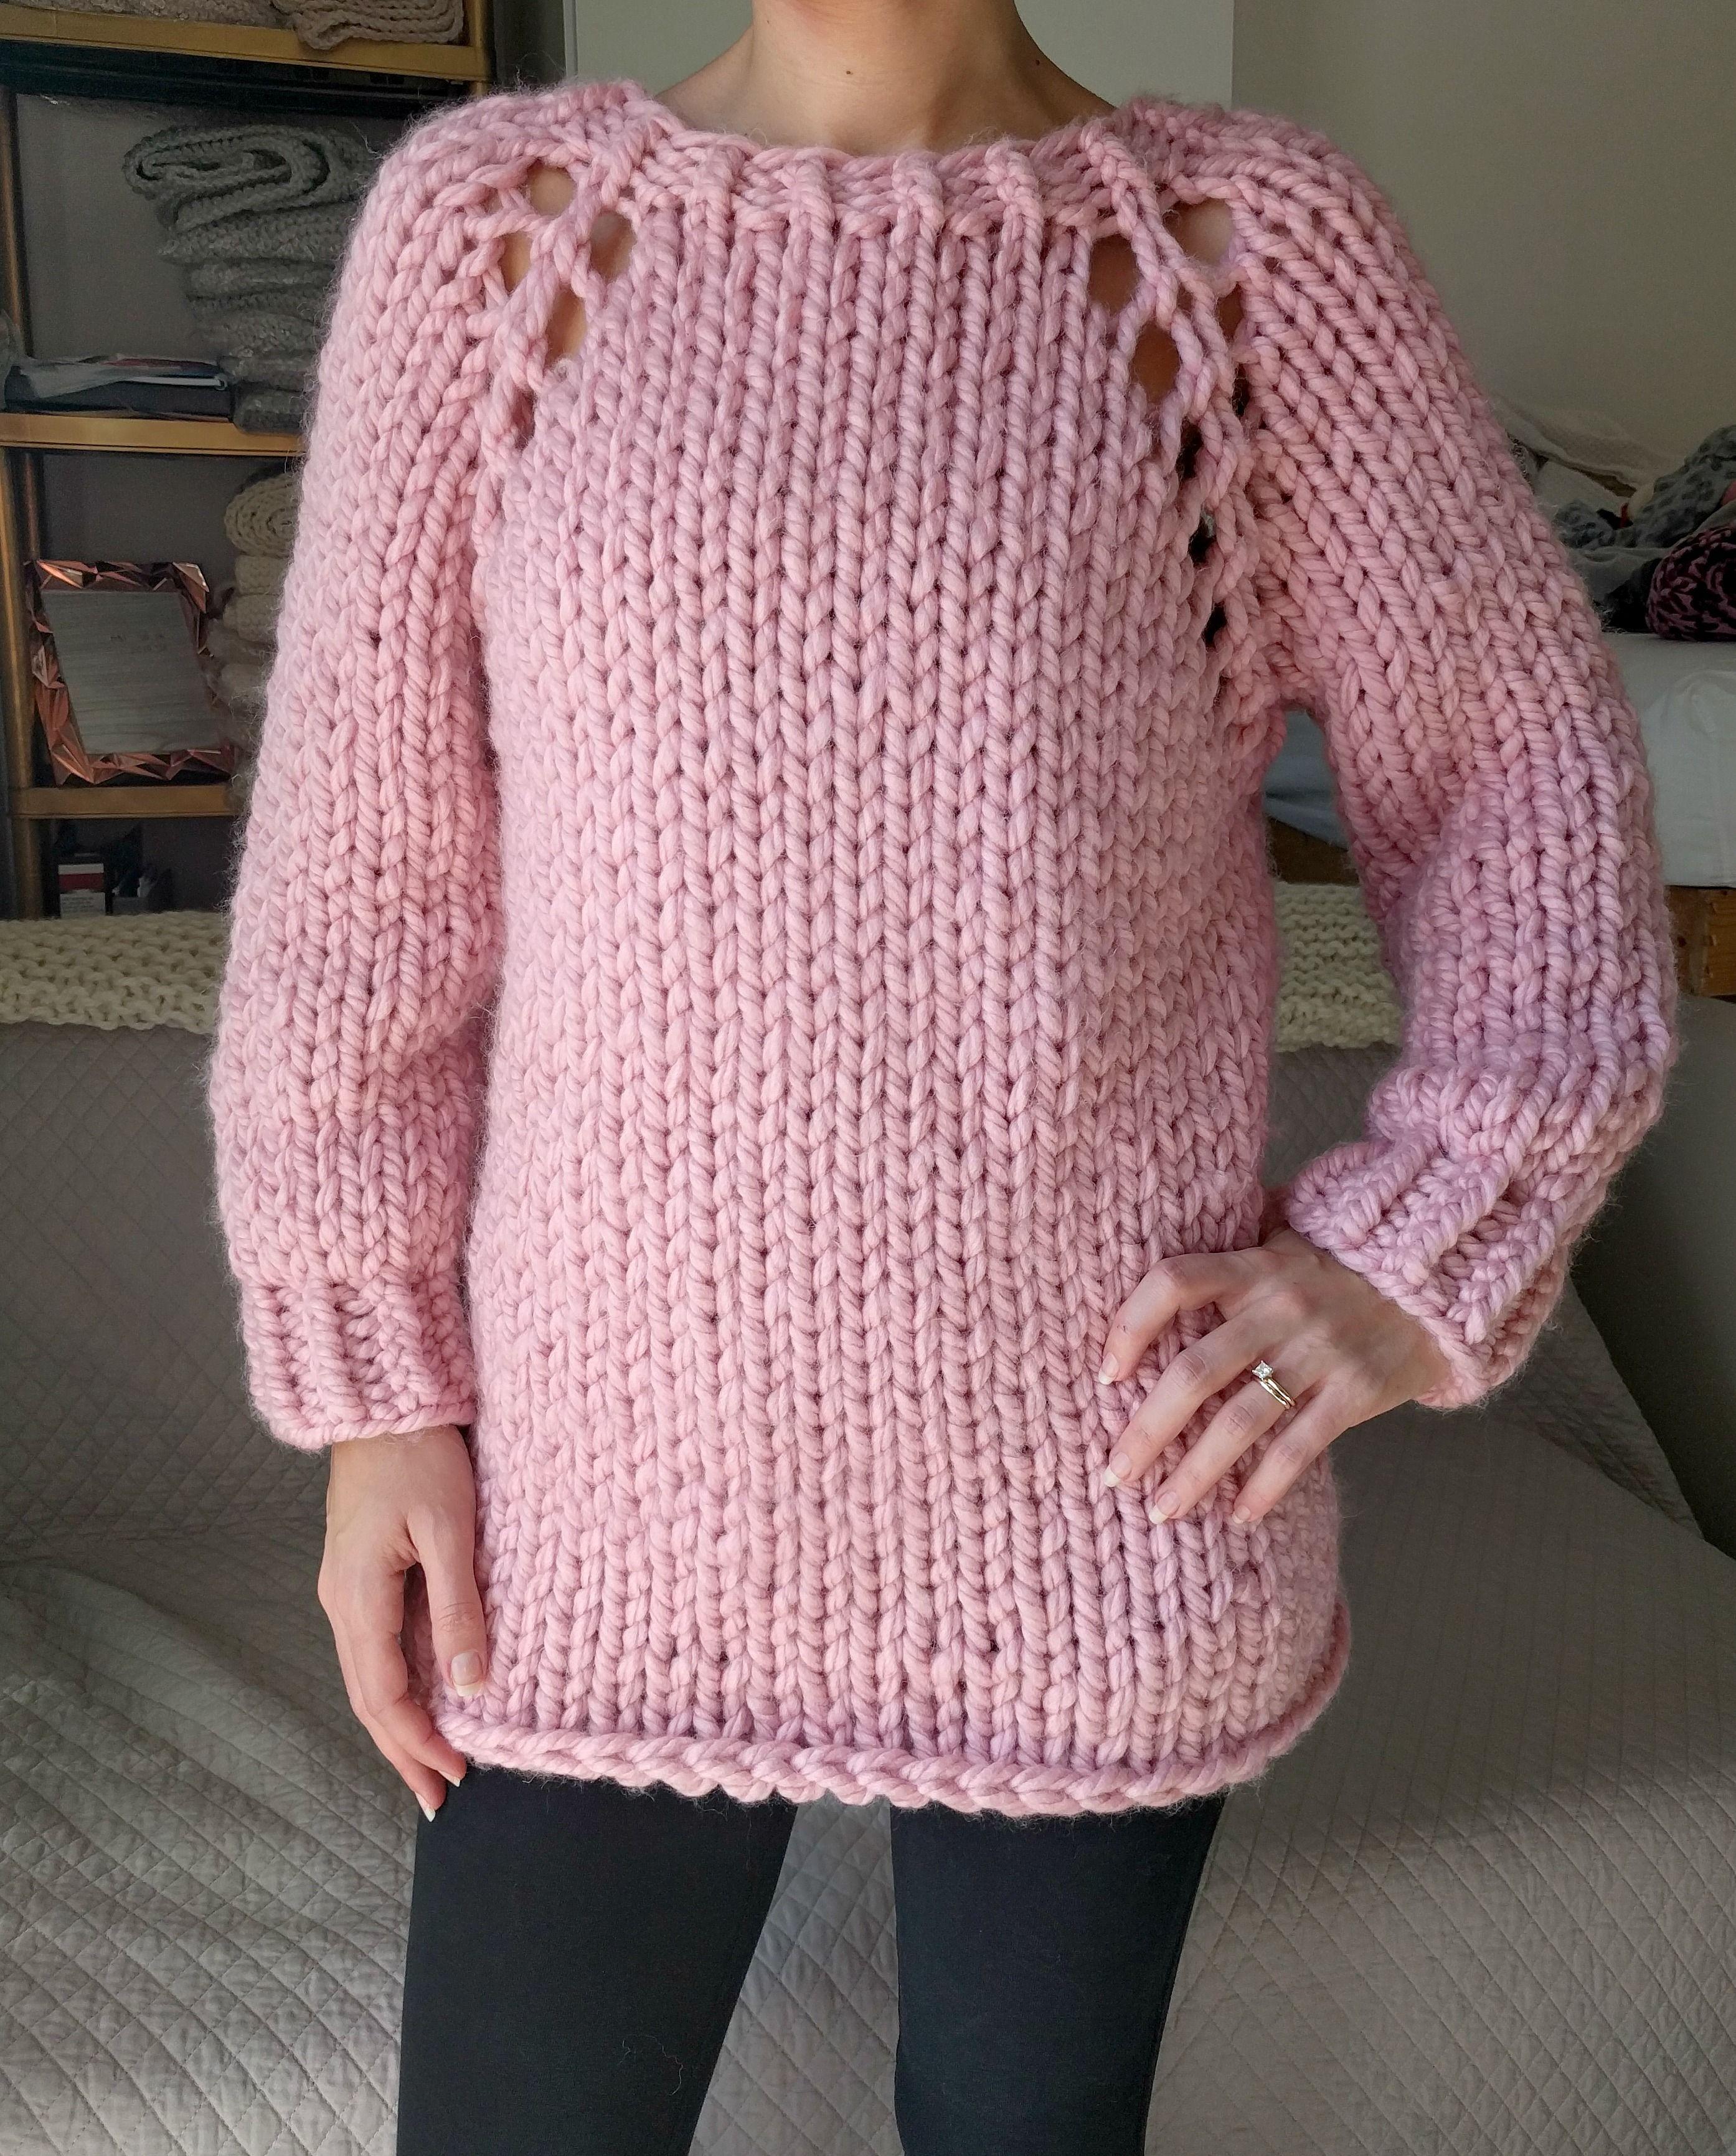 Chunky knit sweater pattern top down raglan sweater pattern chunky knit sweater pattern top down raglan sweater pattern super chunky knitting pattern oversized knit sweater pattern download only bankloansurffo Choice Image